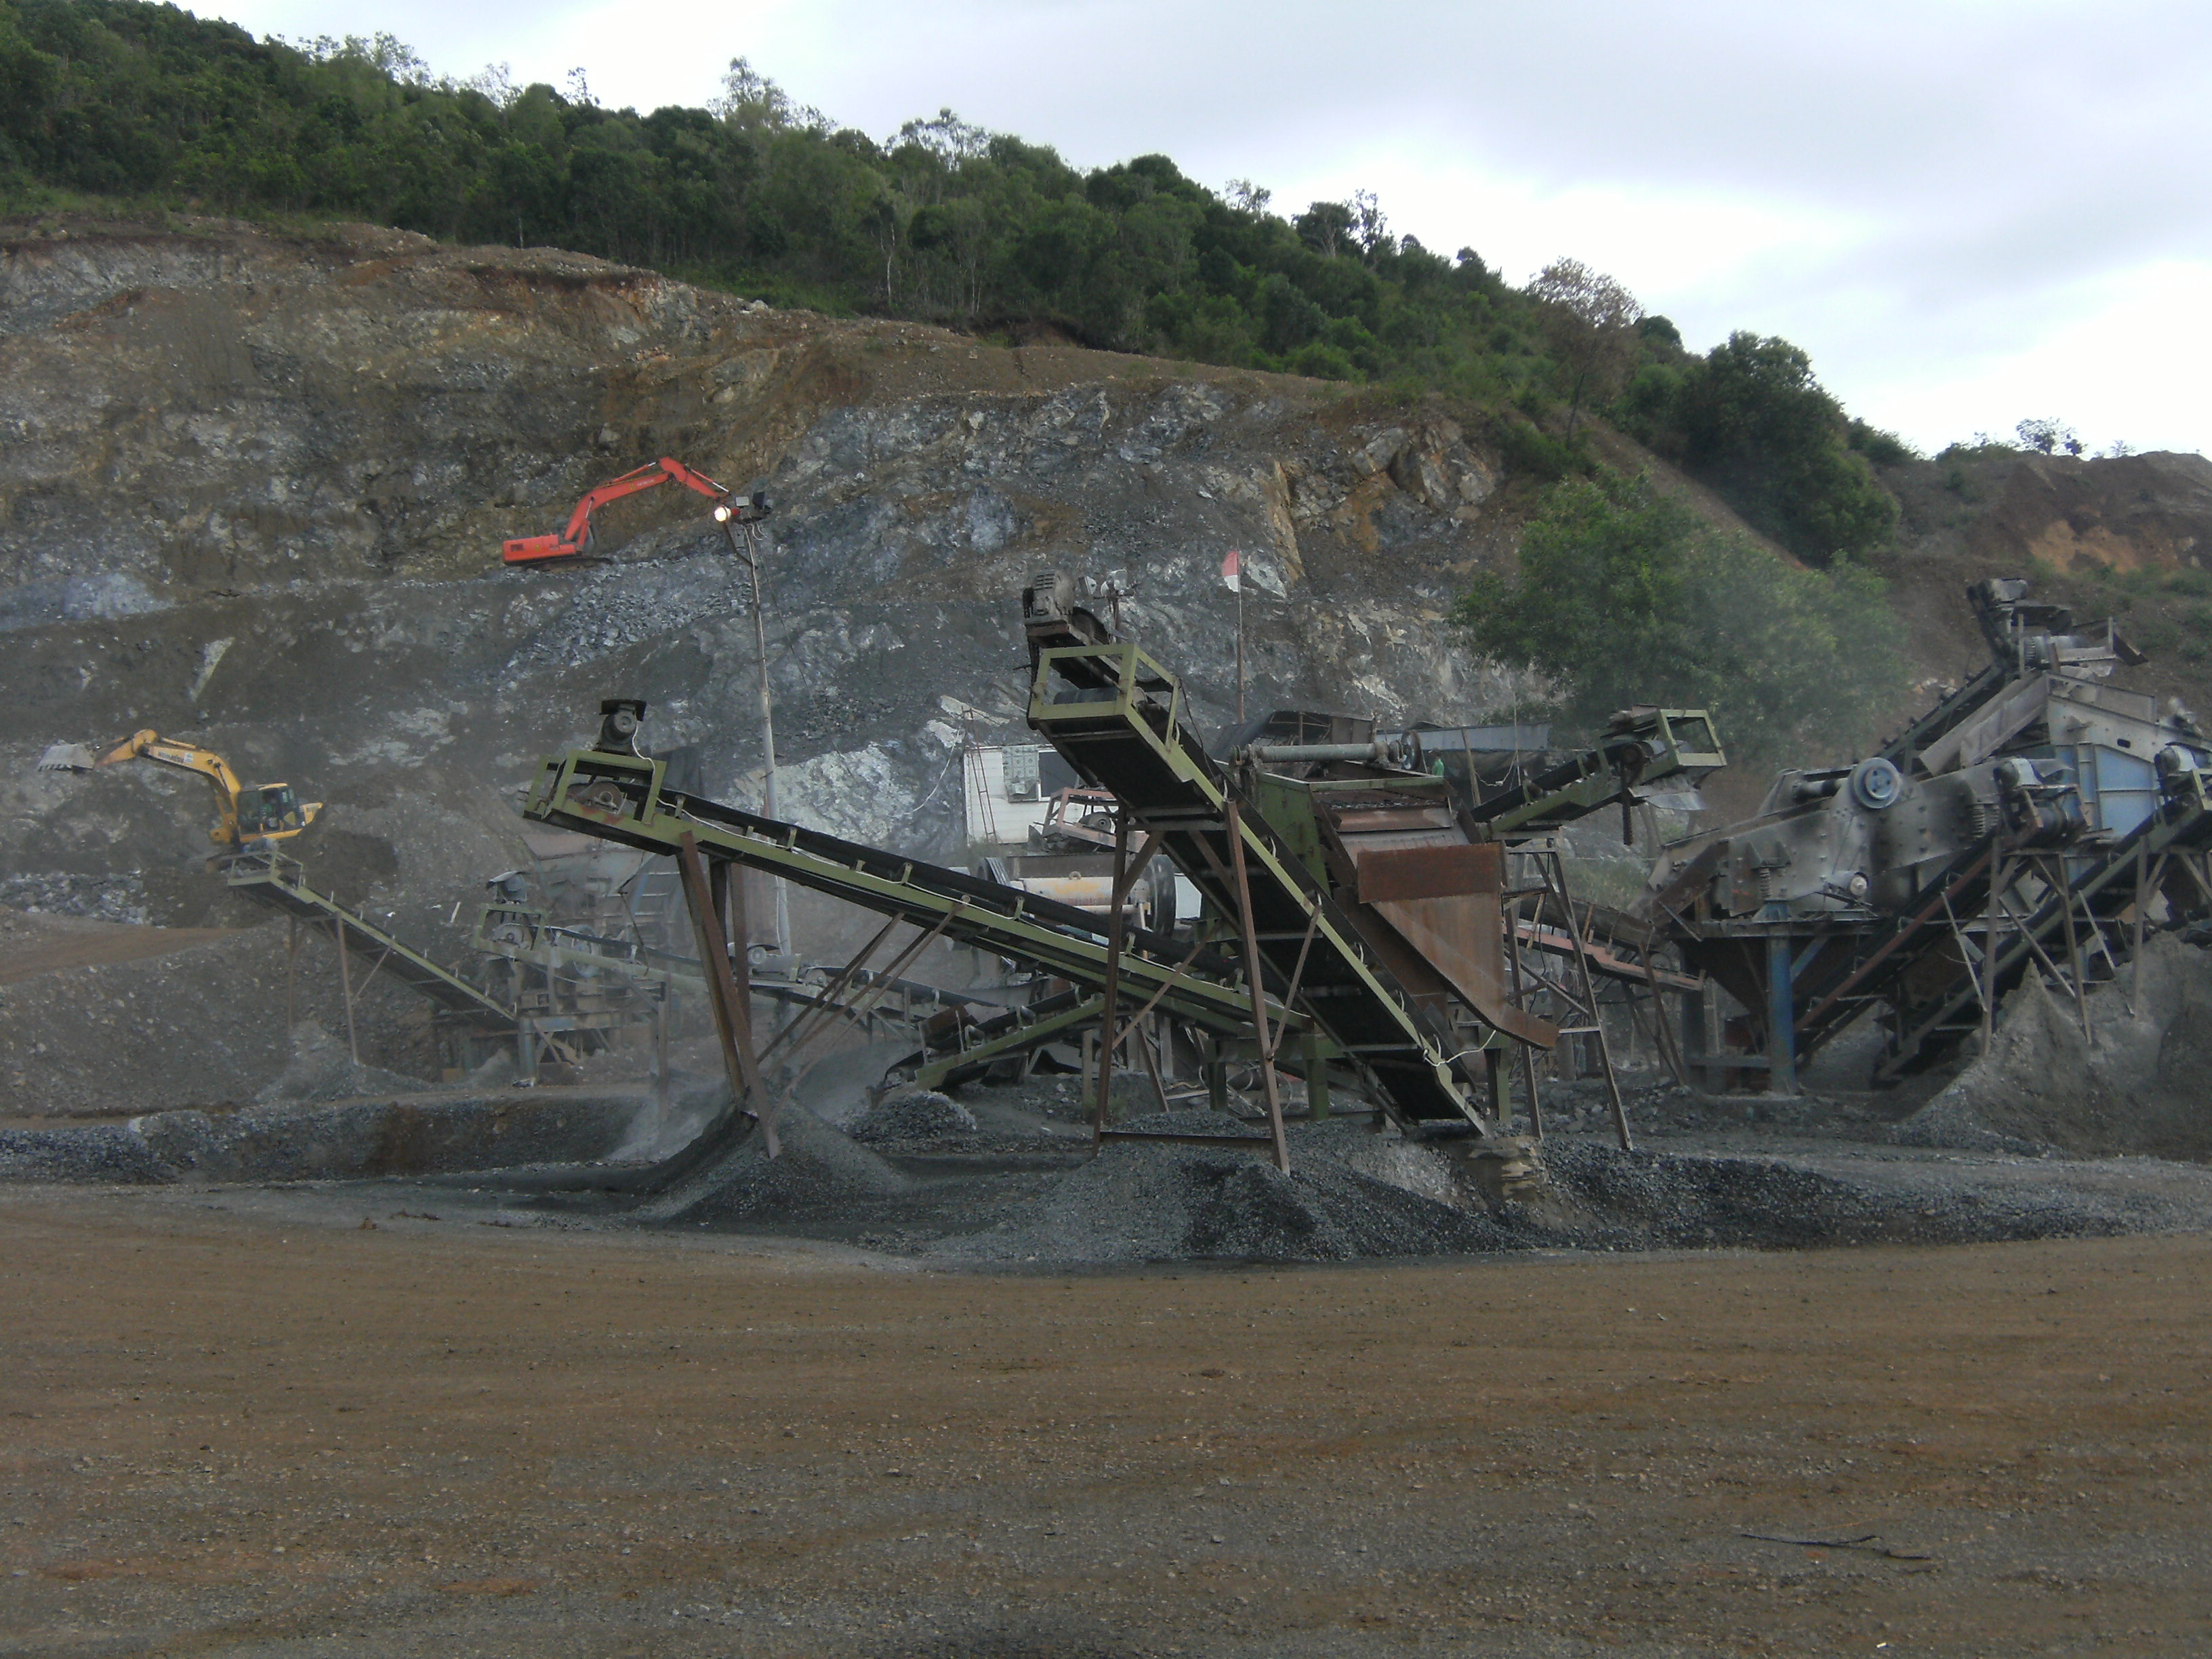 Stone crusher, Crusher, Hill, Industrial, Mining, HQ Photo